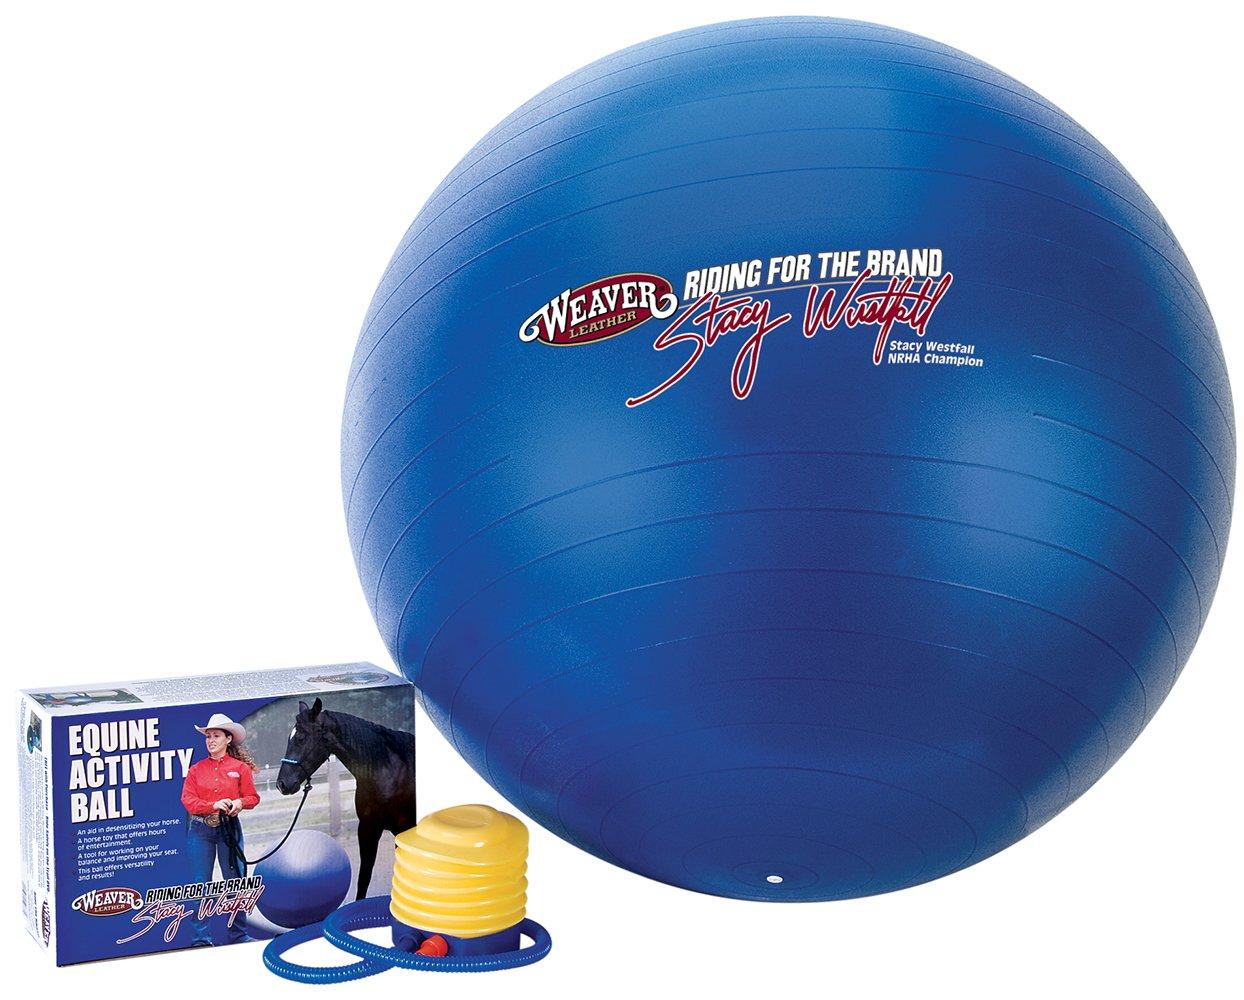 bluee Medium bluee Medium Weaver Leather Stacy Westfall Activity Ball